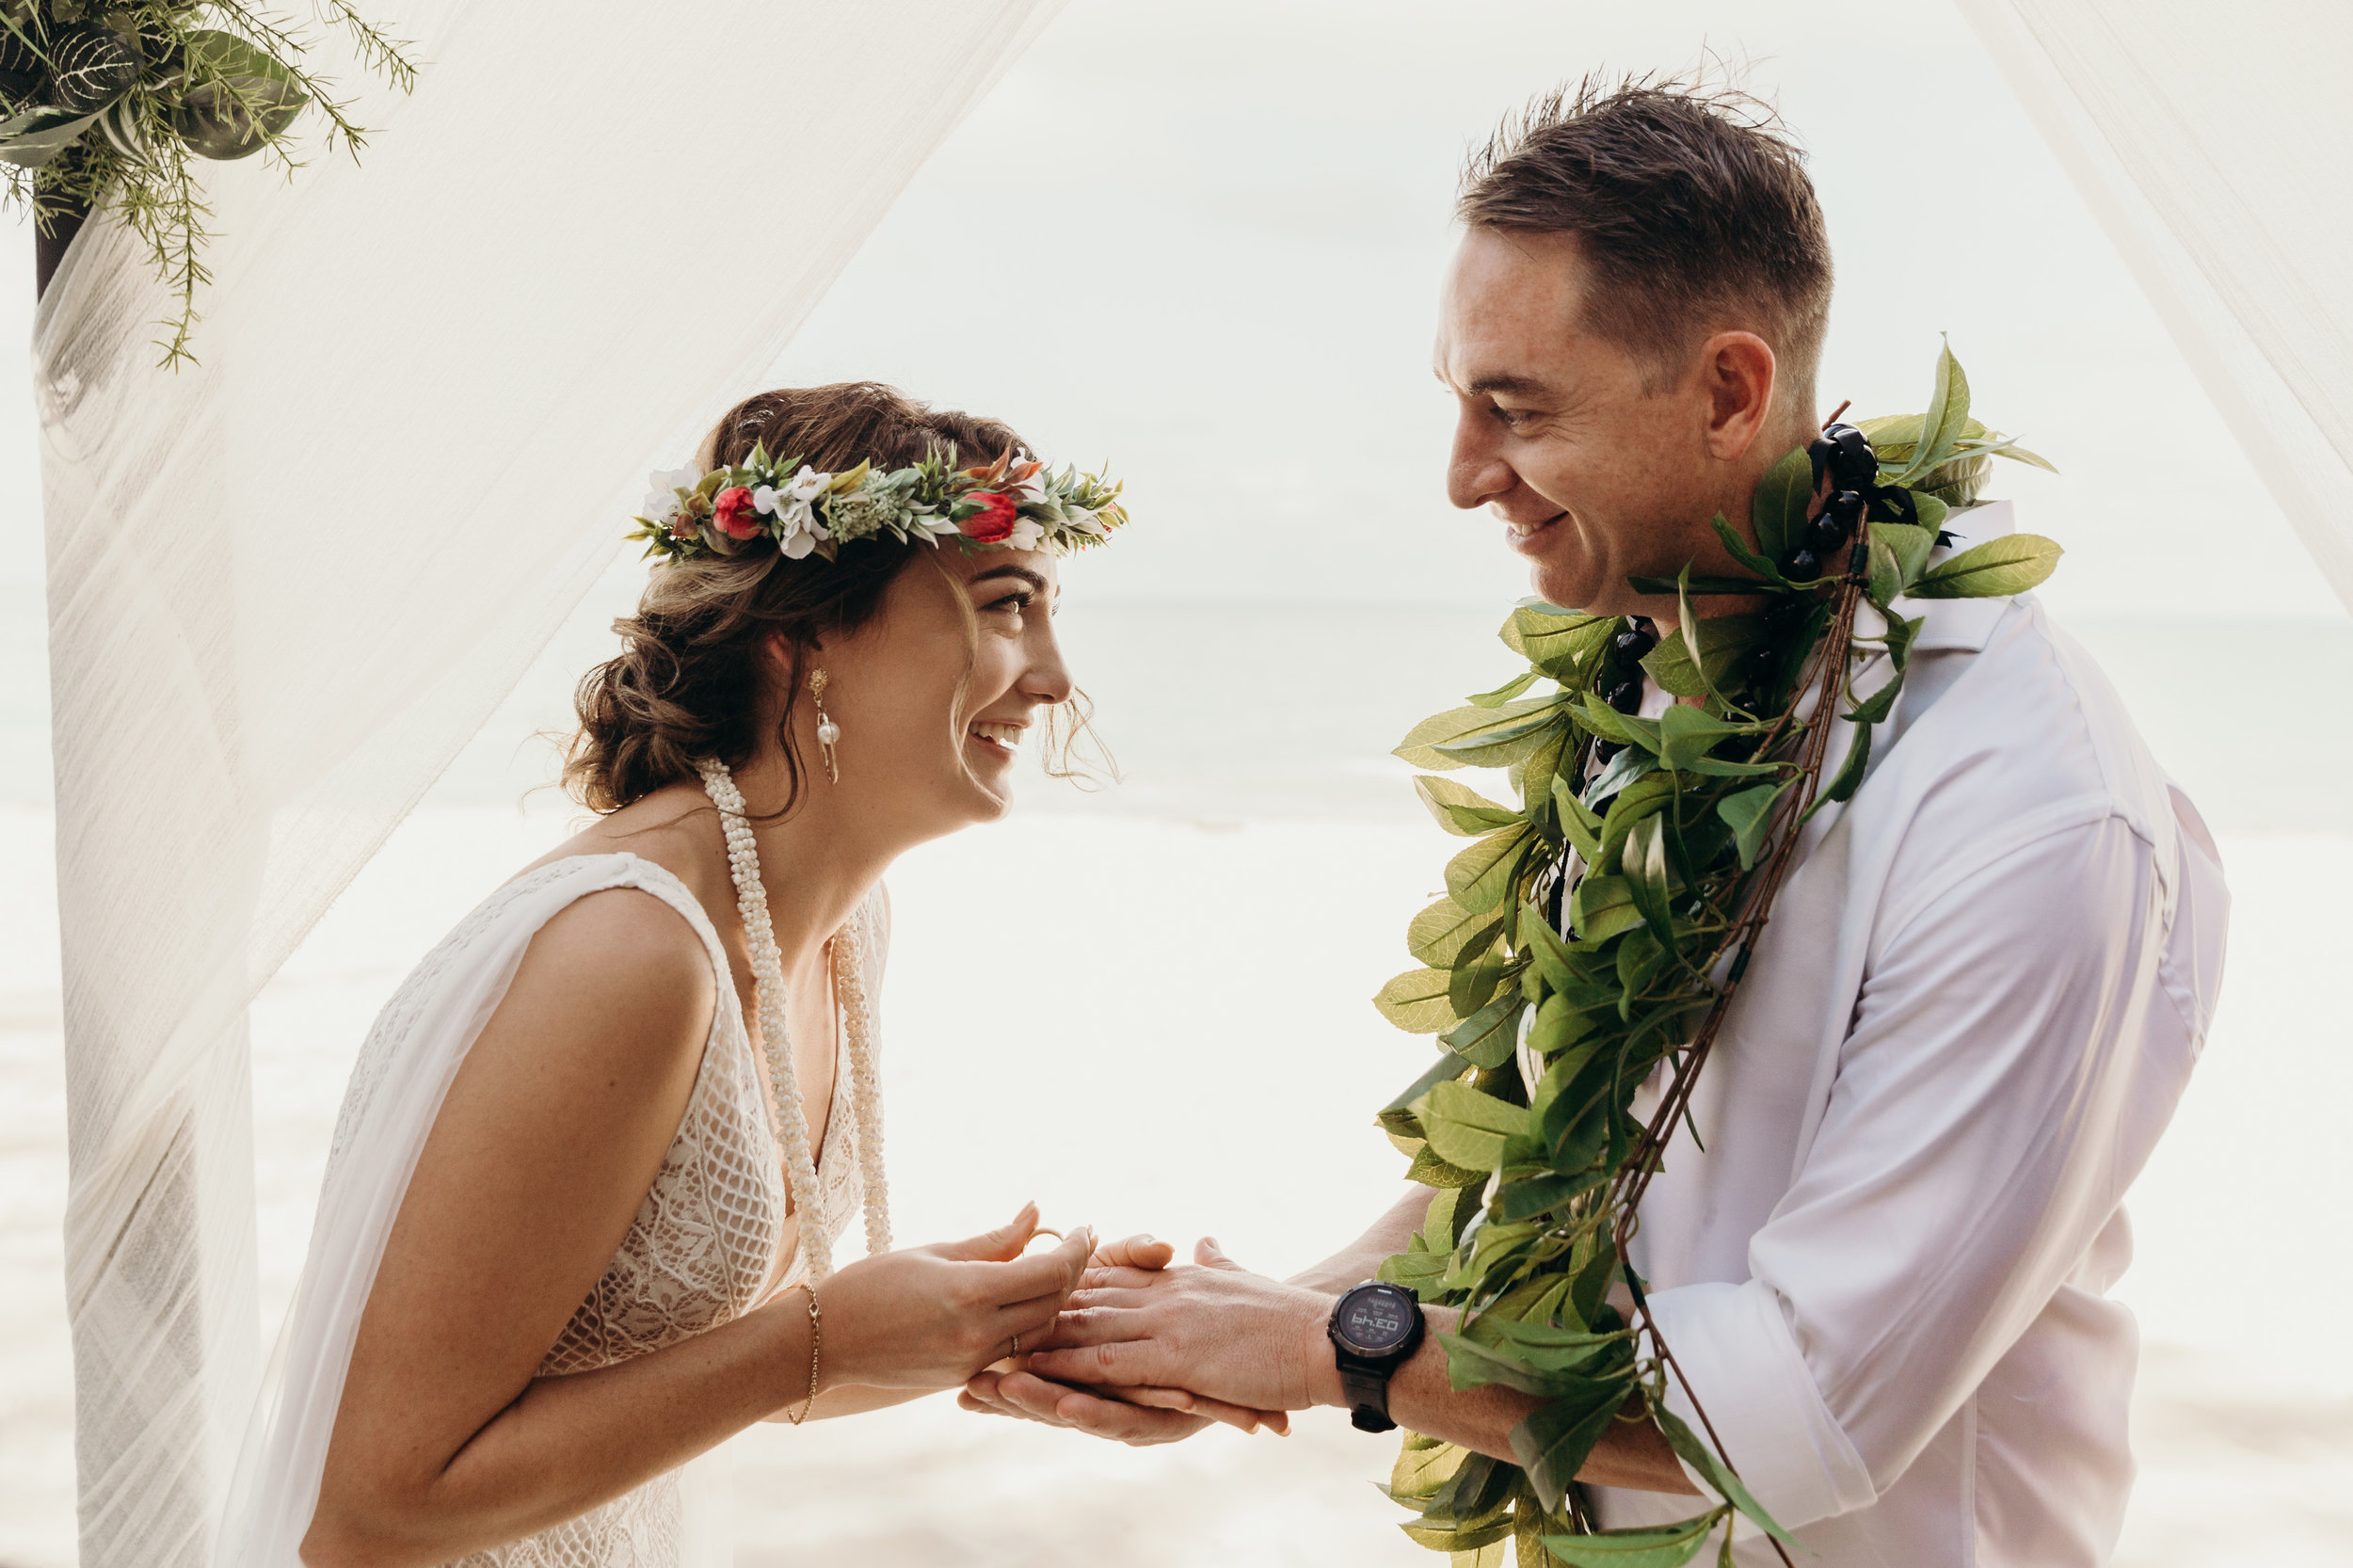 HAWAII-WEDDING-PHOTOGRAPHER-ALOHILANI-RESORT-KEANI-BAKULA-41.jpg